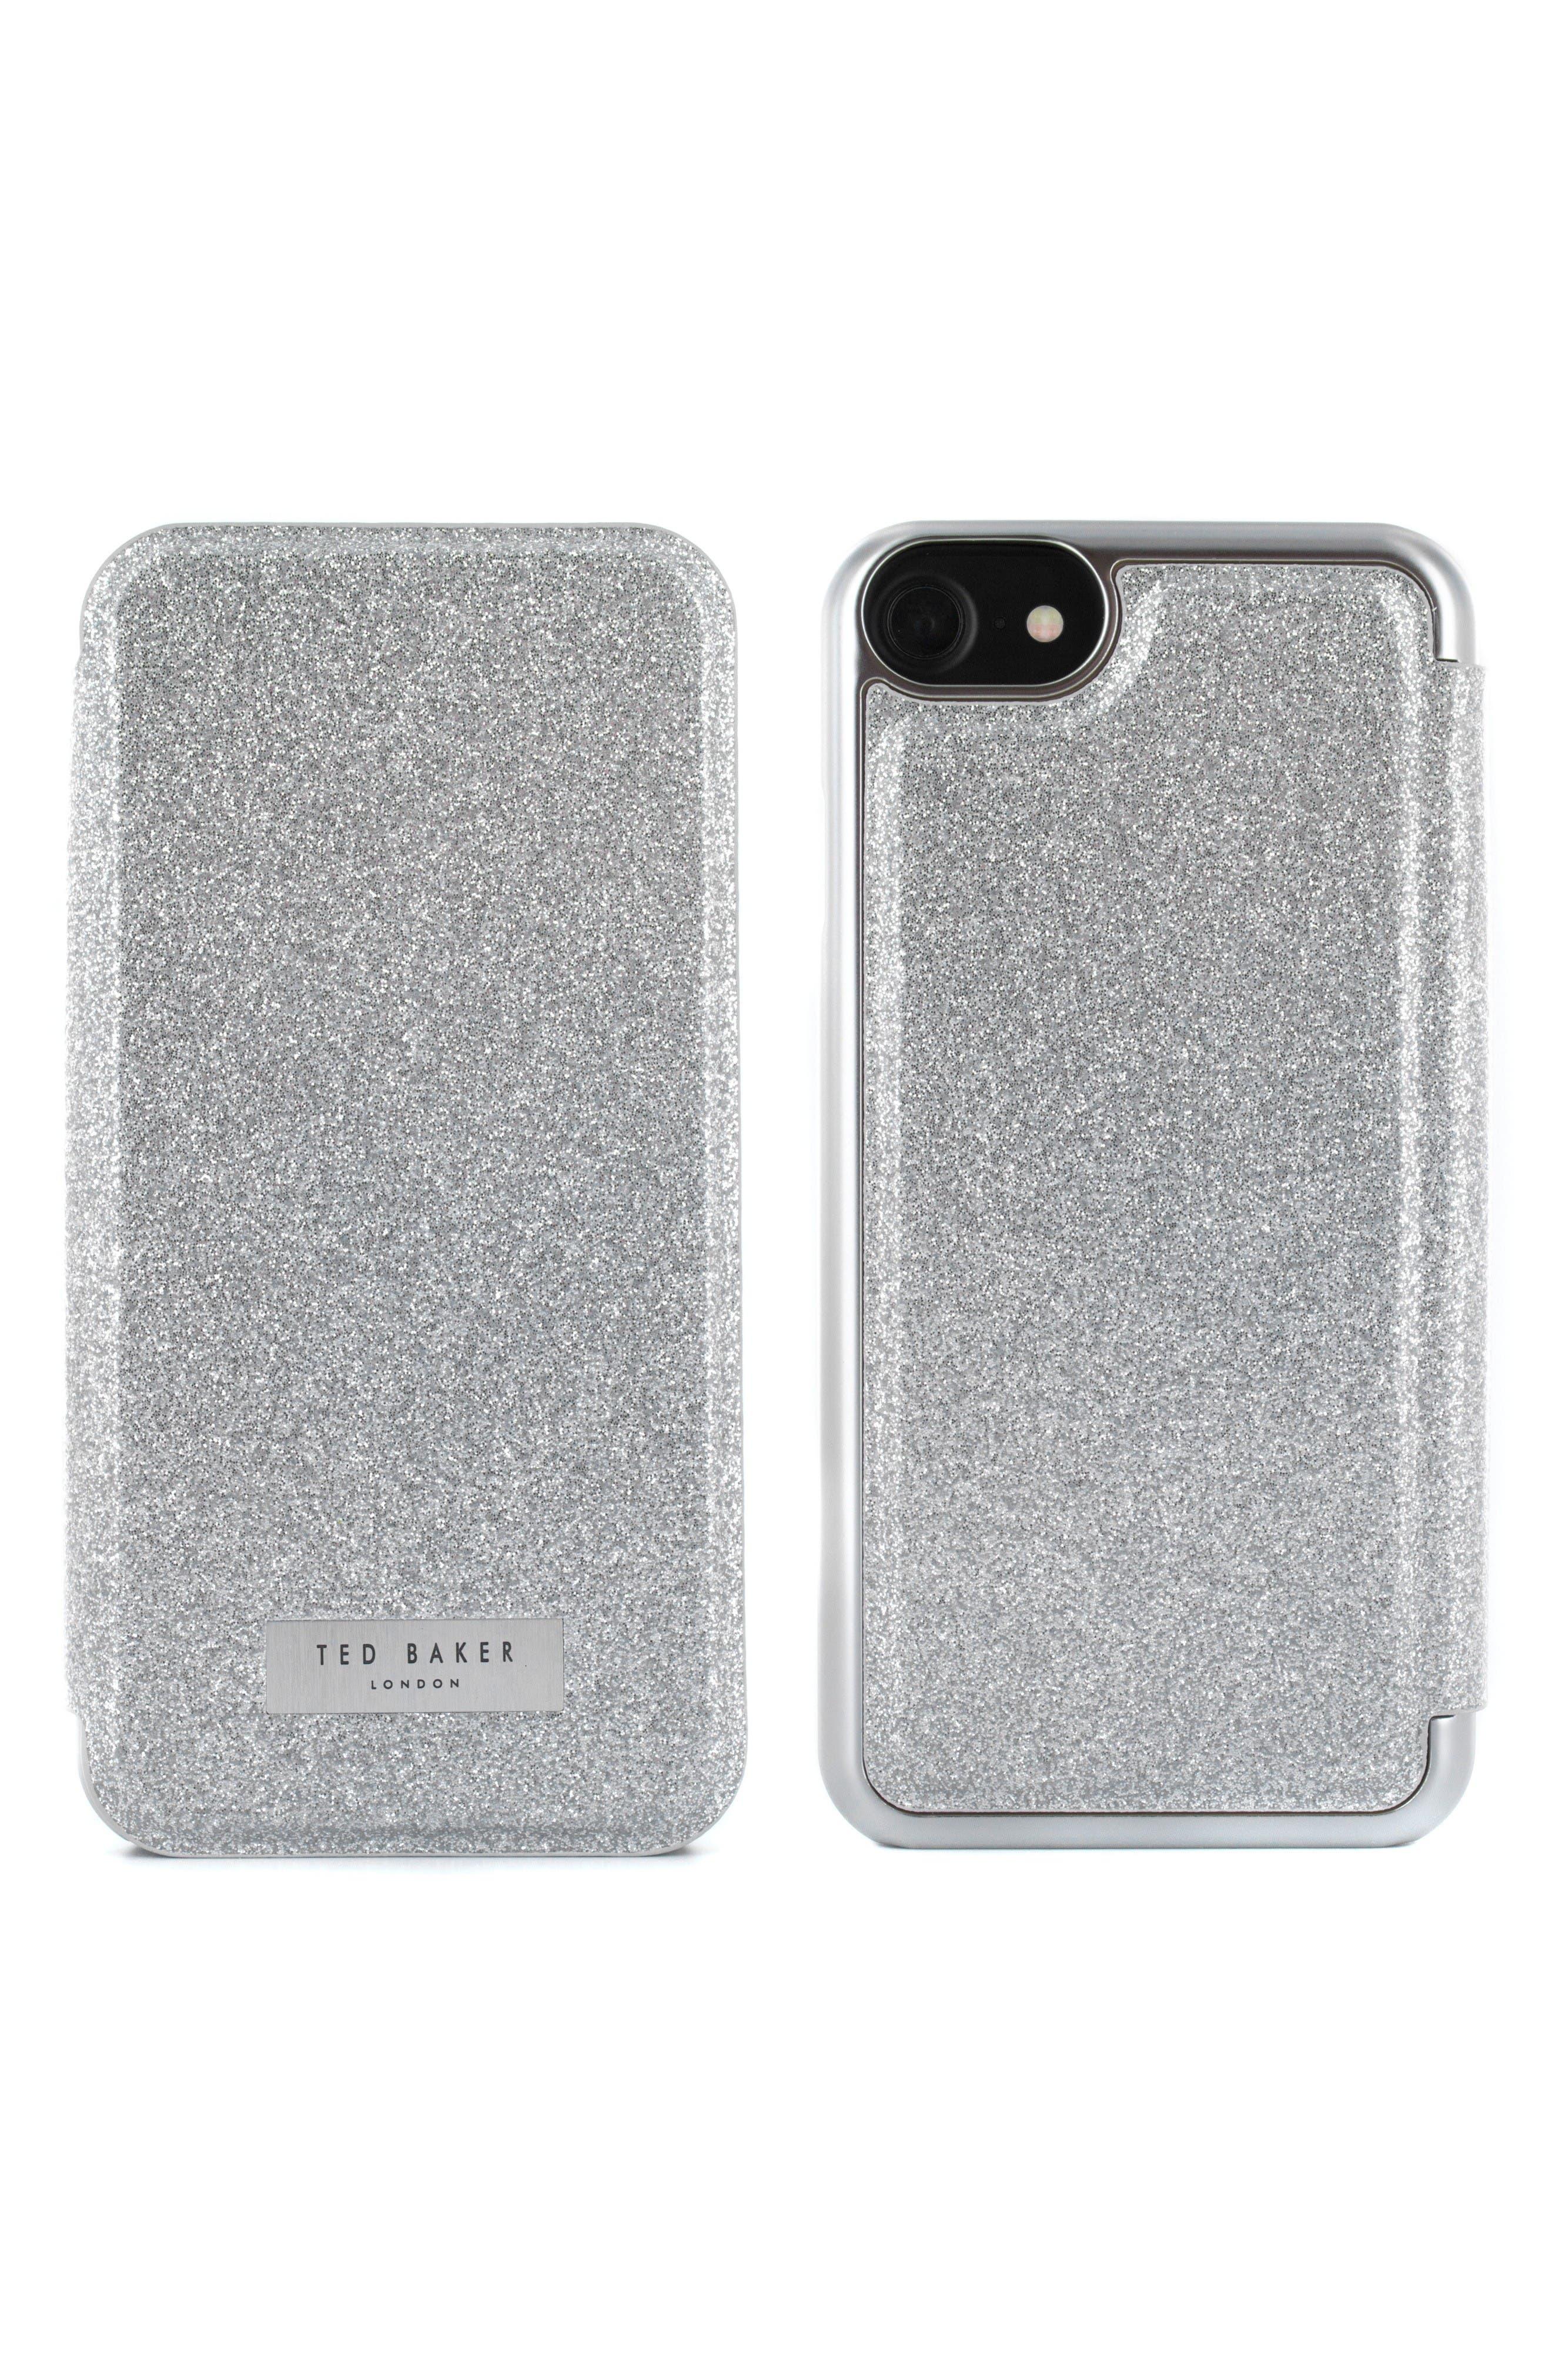 Glitsie iPhone 6/6s/7/8 Mirror Folio Case,                             Alternate thumbnail 2, color,                             Silver